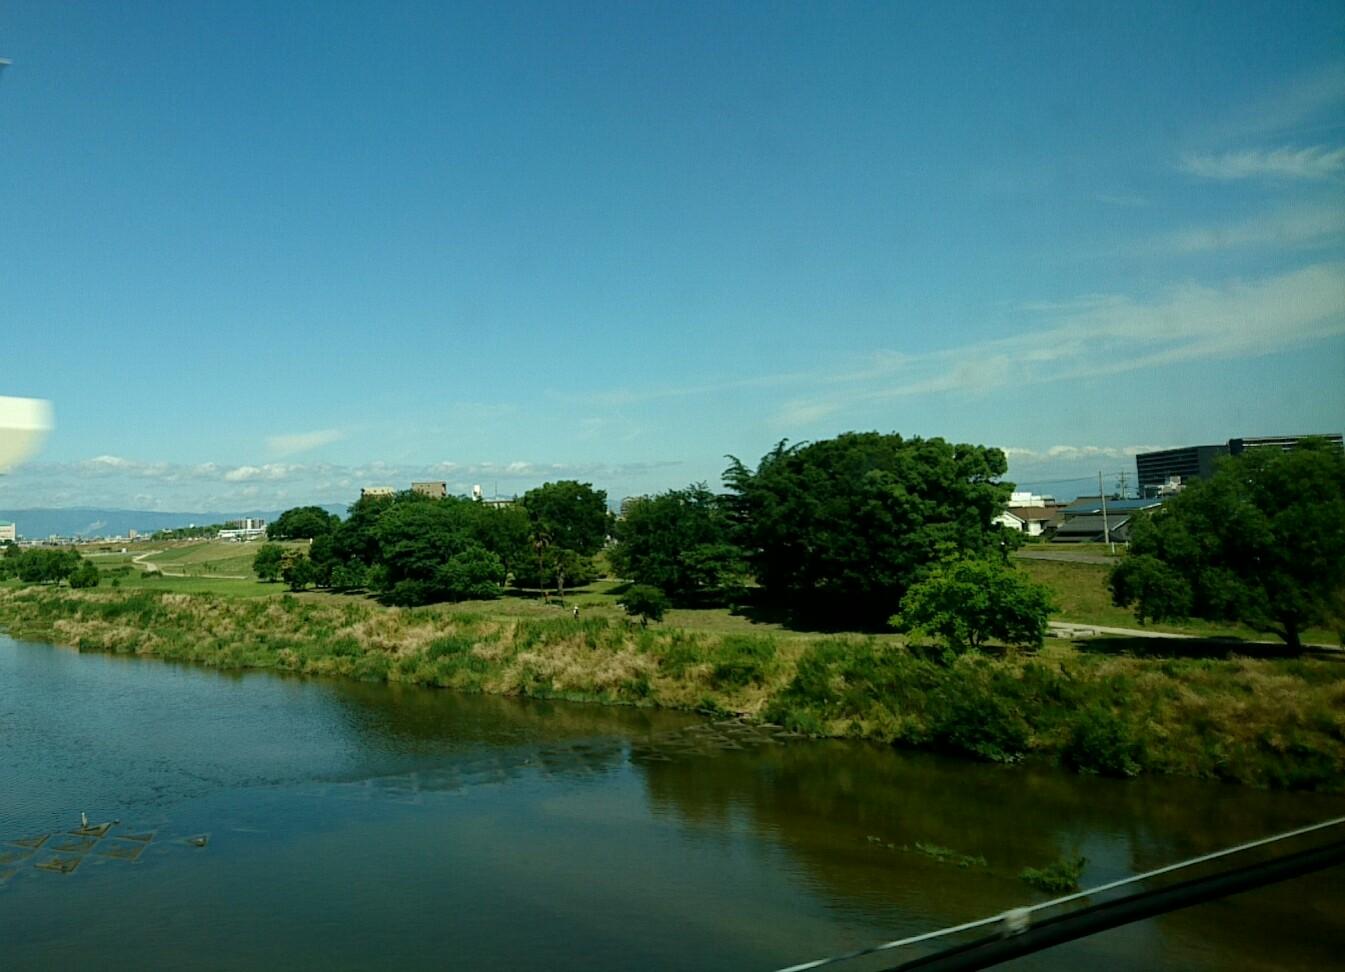 名古屋は晴天